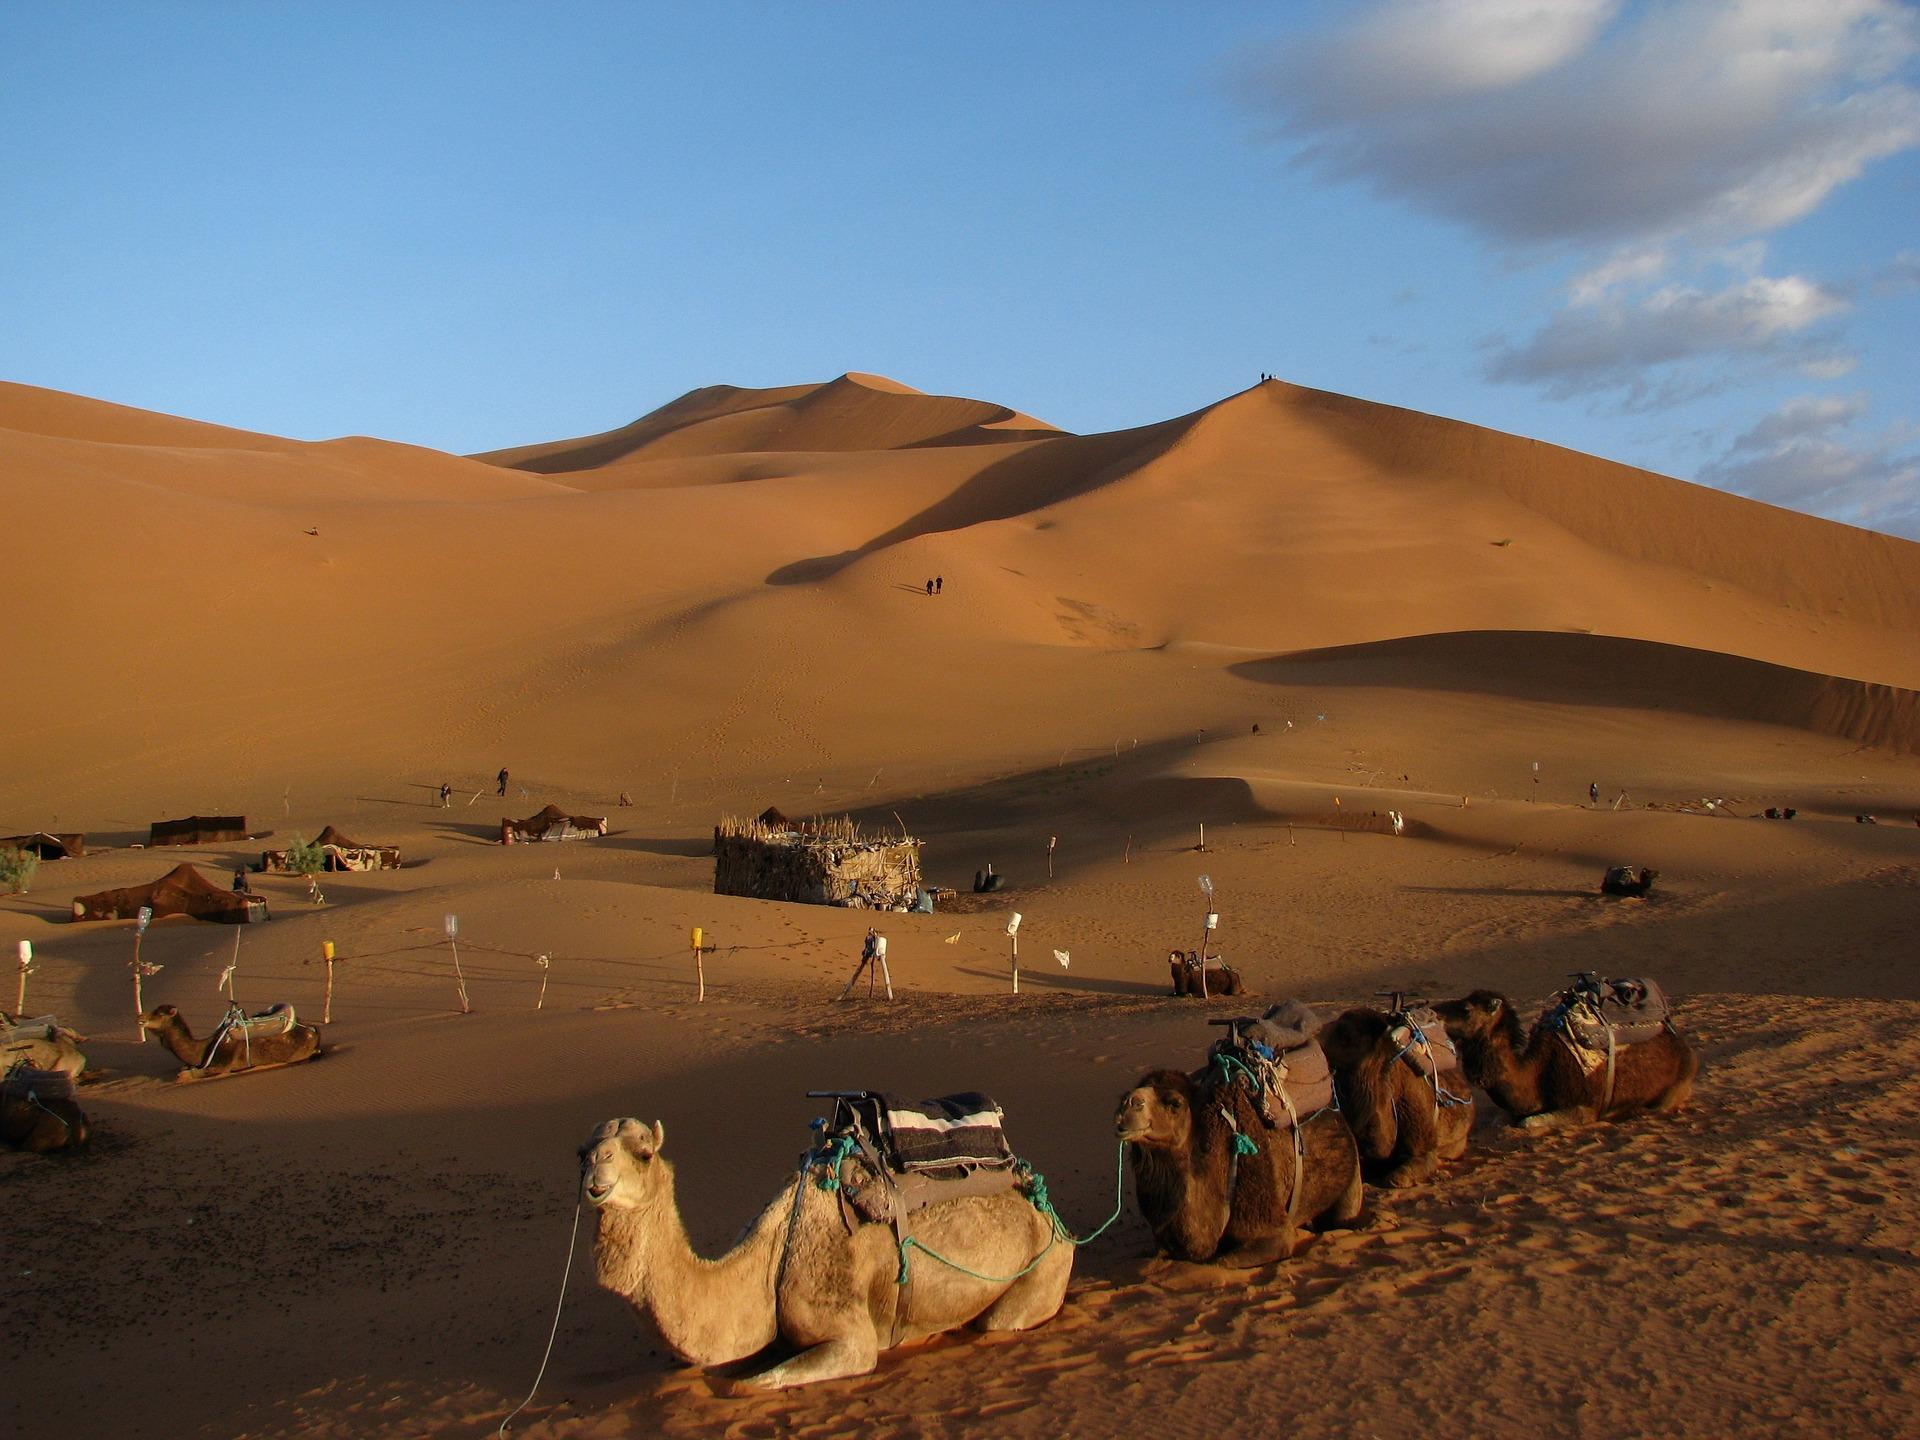 camel-1632243_1920